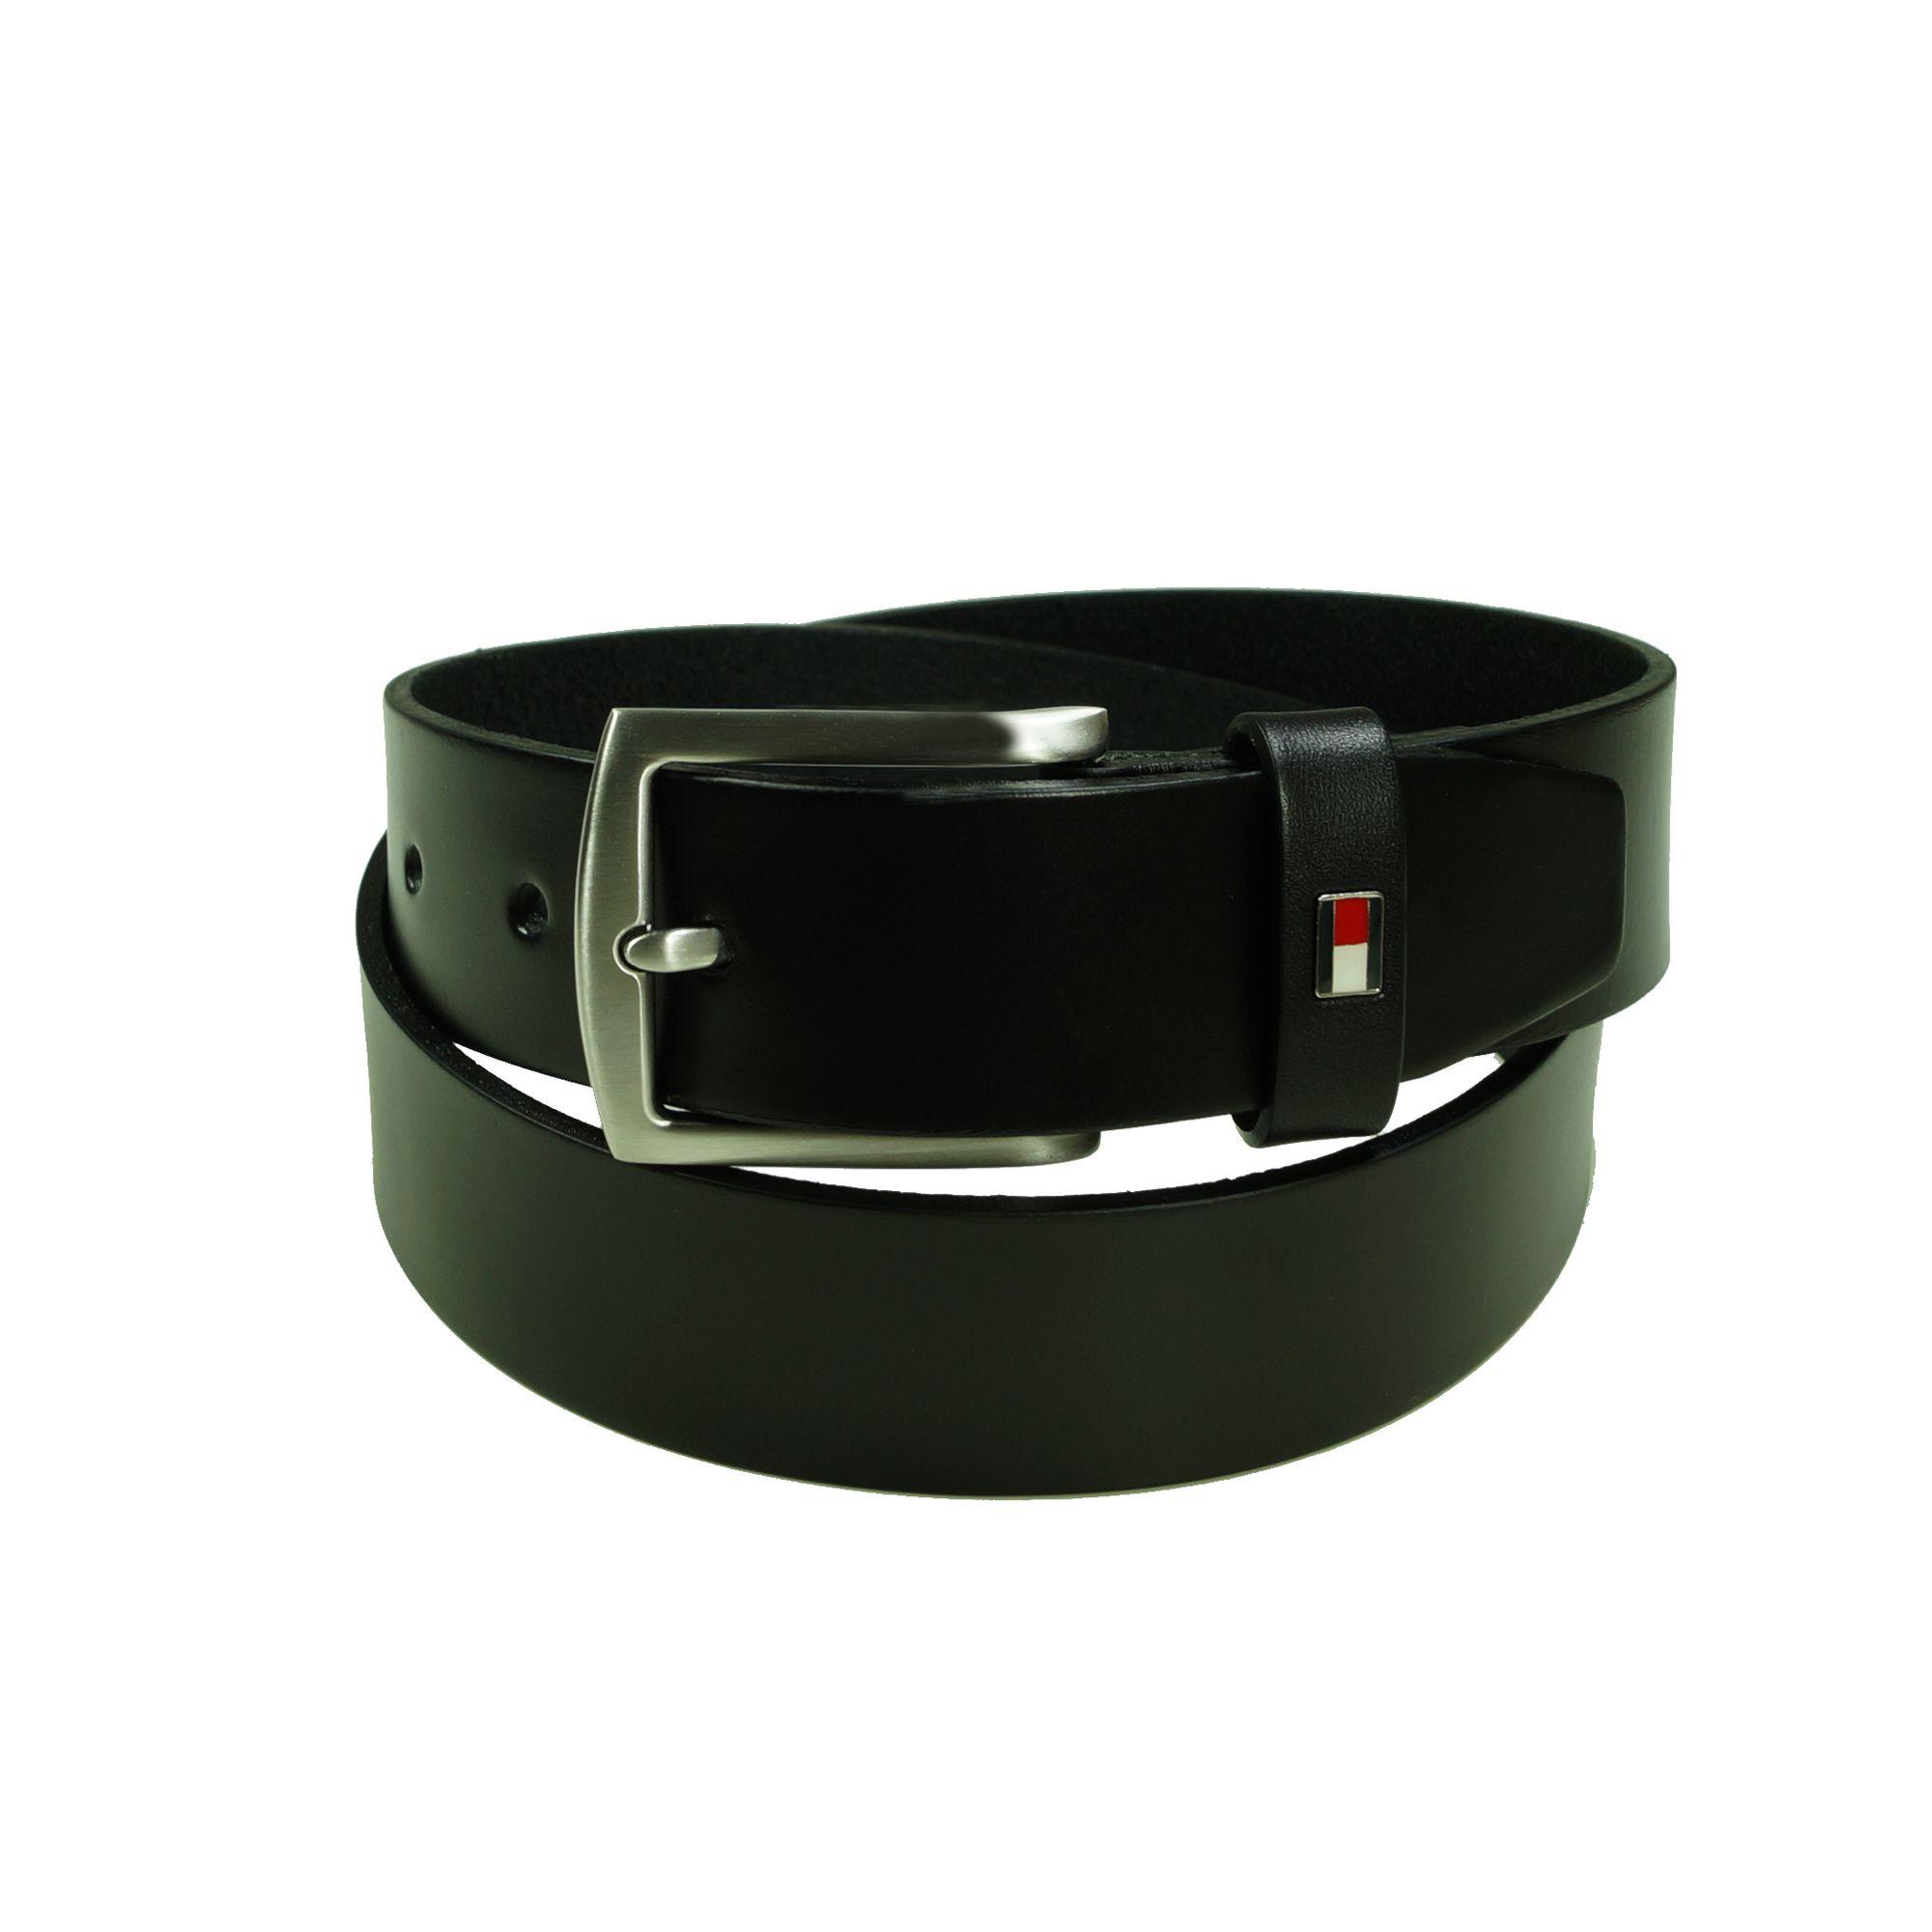 tommy hilfiger herren g rtel new denton belt giftbox 3 5 schwarz 85cm. Black Bedroom Furniture Sets. Home Design Ideas